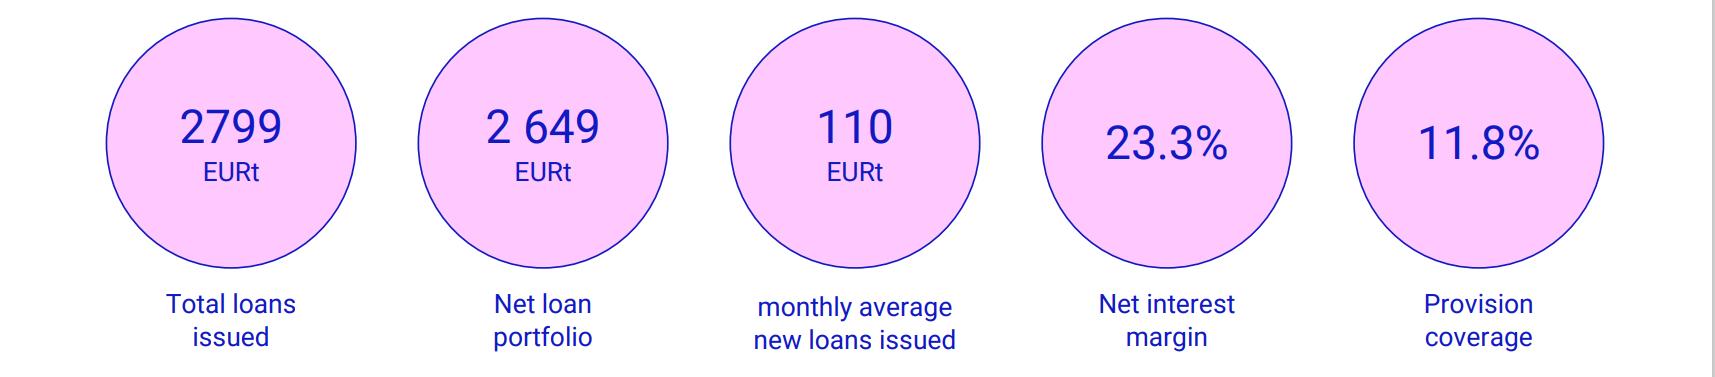 fresh finance key financials 2020